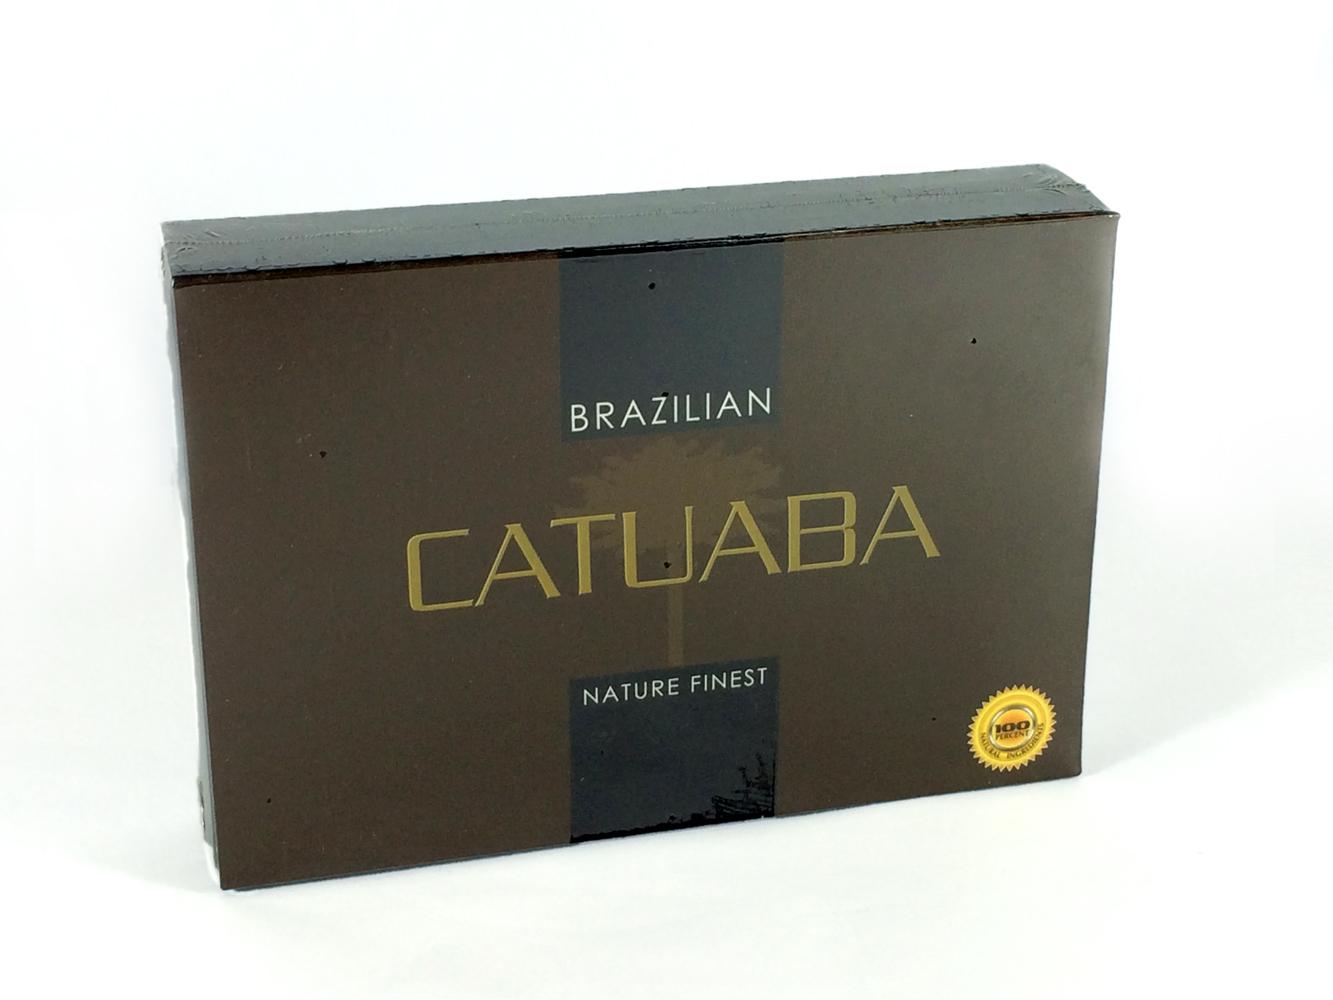 Buy [FREE SHIPPING] 1 BOX Brazilian Catuaba Natural Fitnest Catuaba Bark Nourishing Essence